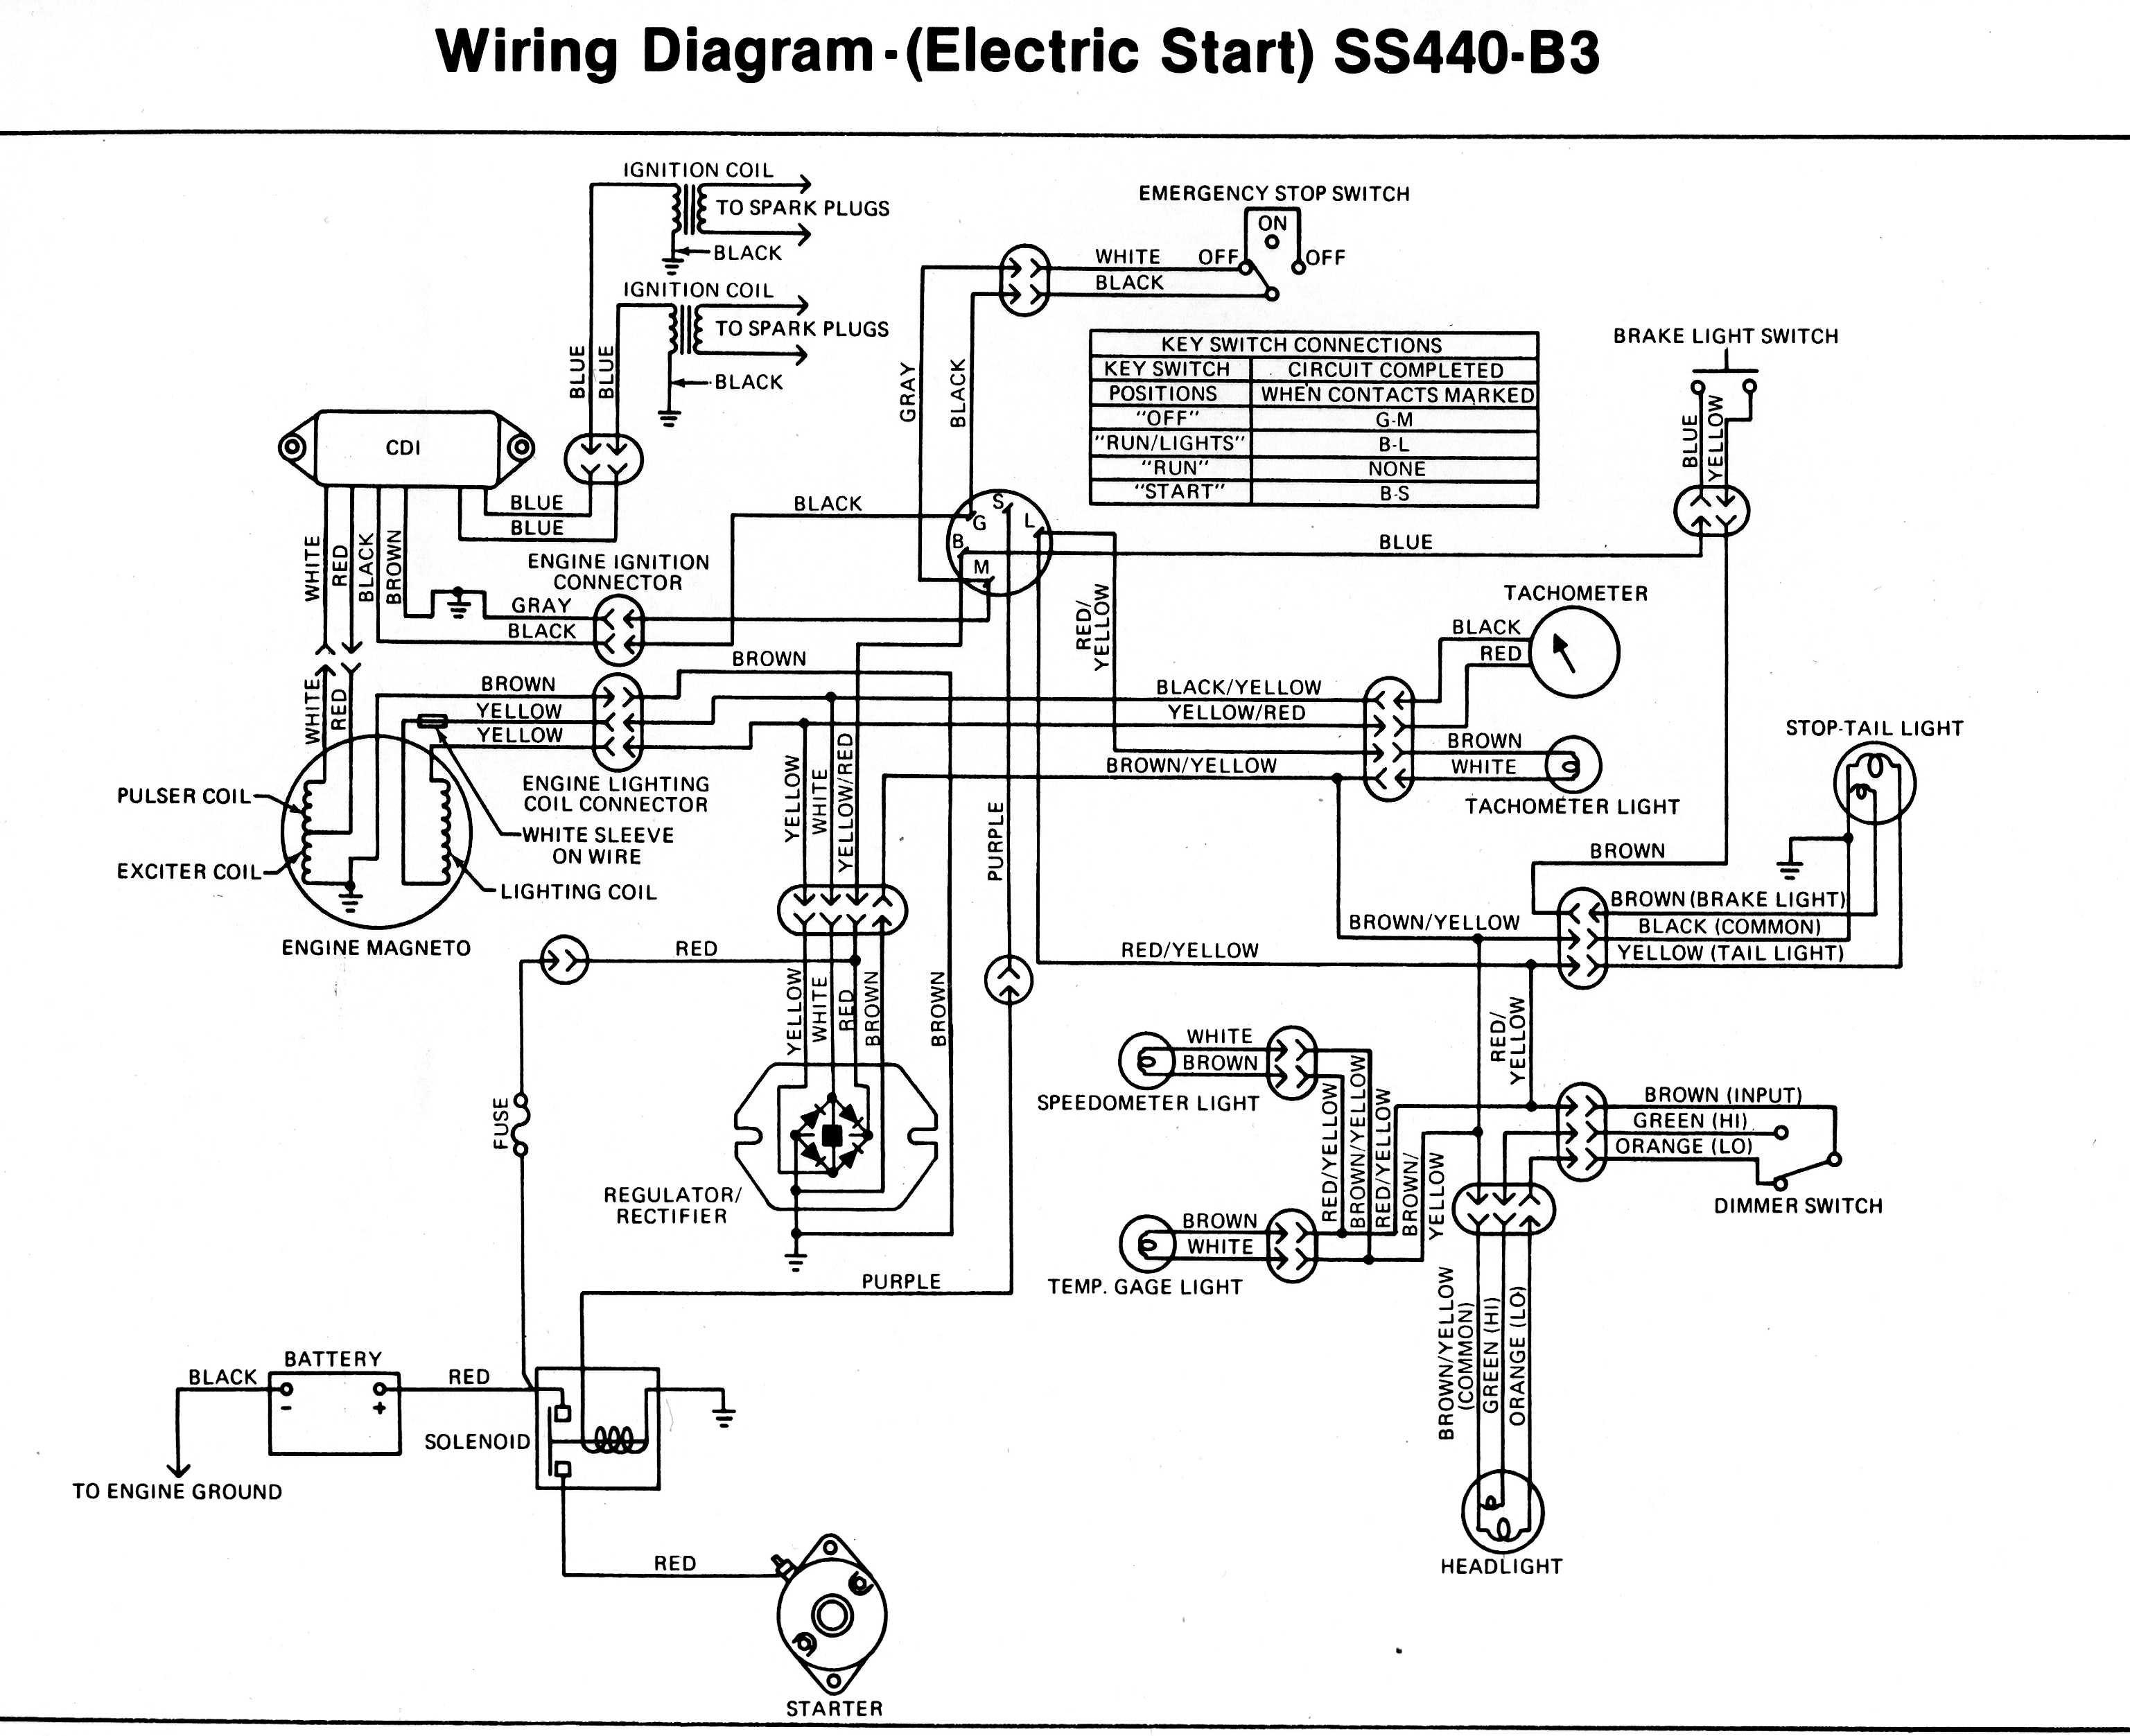 Kawasaki 550 Sx Wiring Diagram Wiring Diagrams Guide Guide Massimocariello It